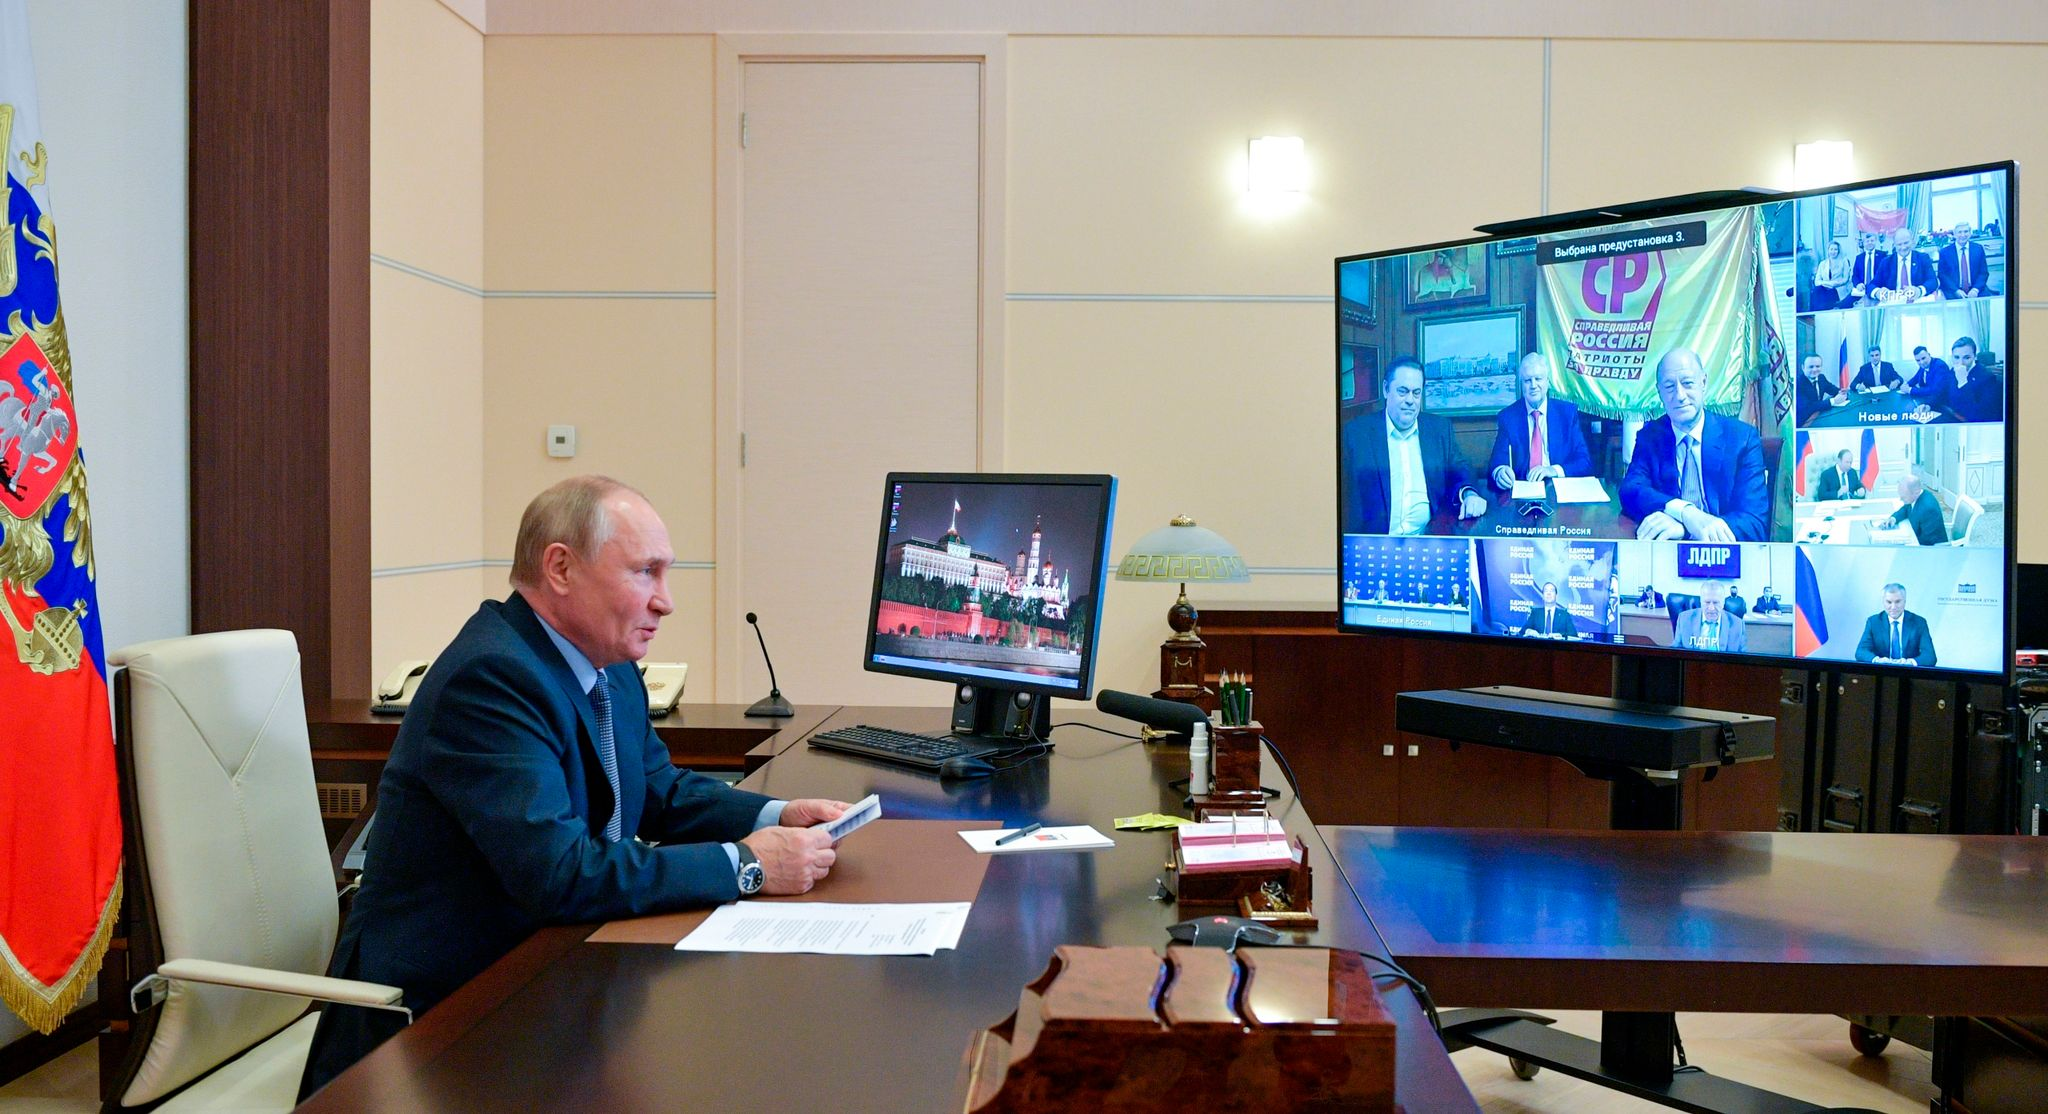 Putin lobt faire Dumawahl - Hunderte protestieren in Moskau